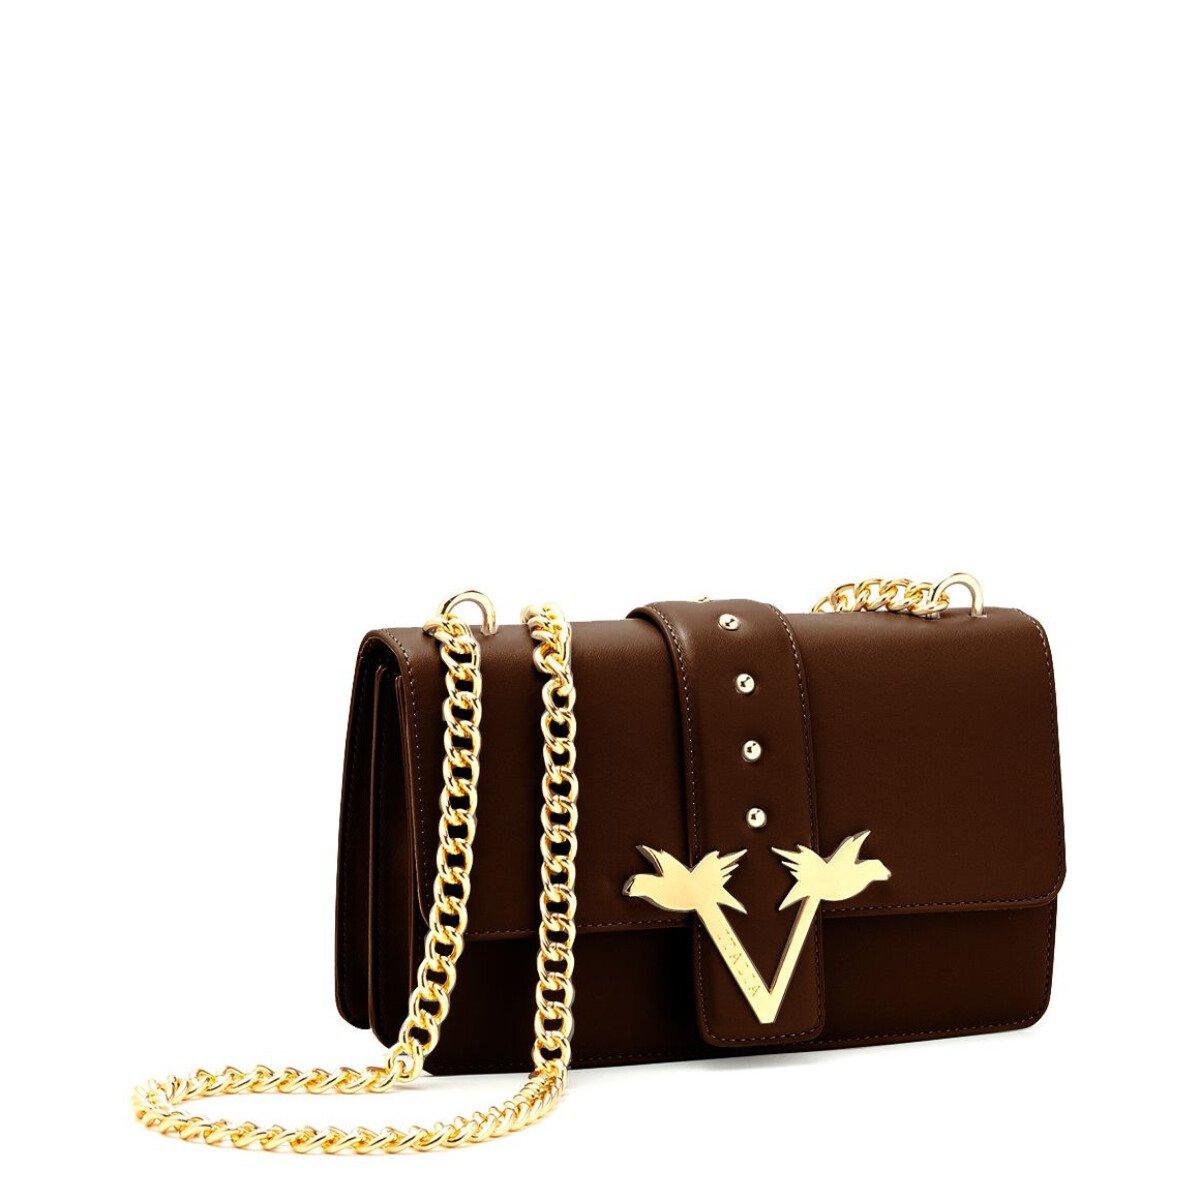 19v69 Italia Women's Shoulder Bag Various Colours 318676 - brown UNICA